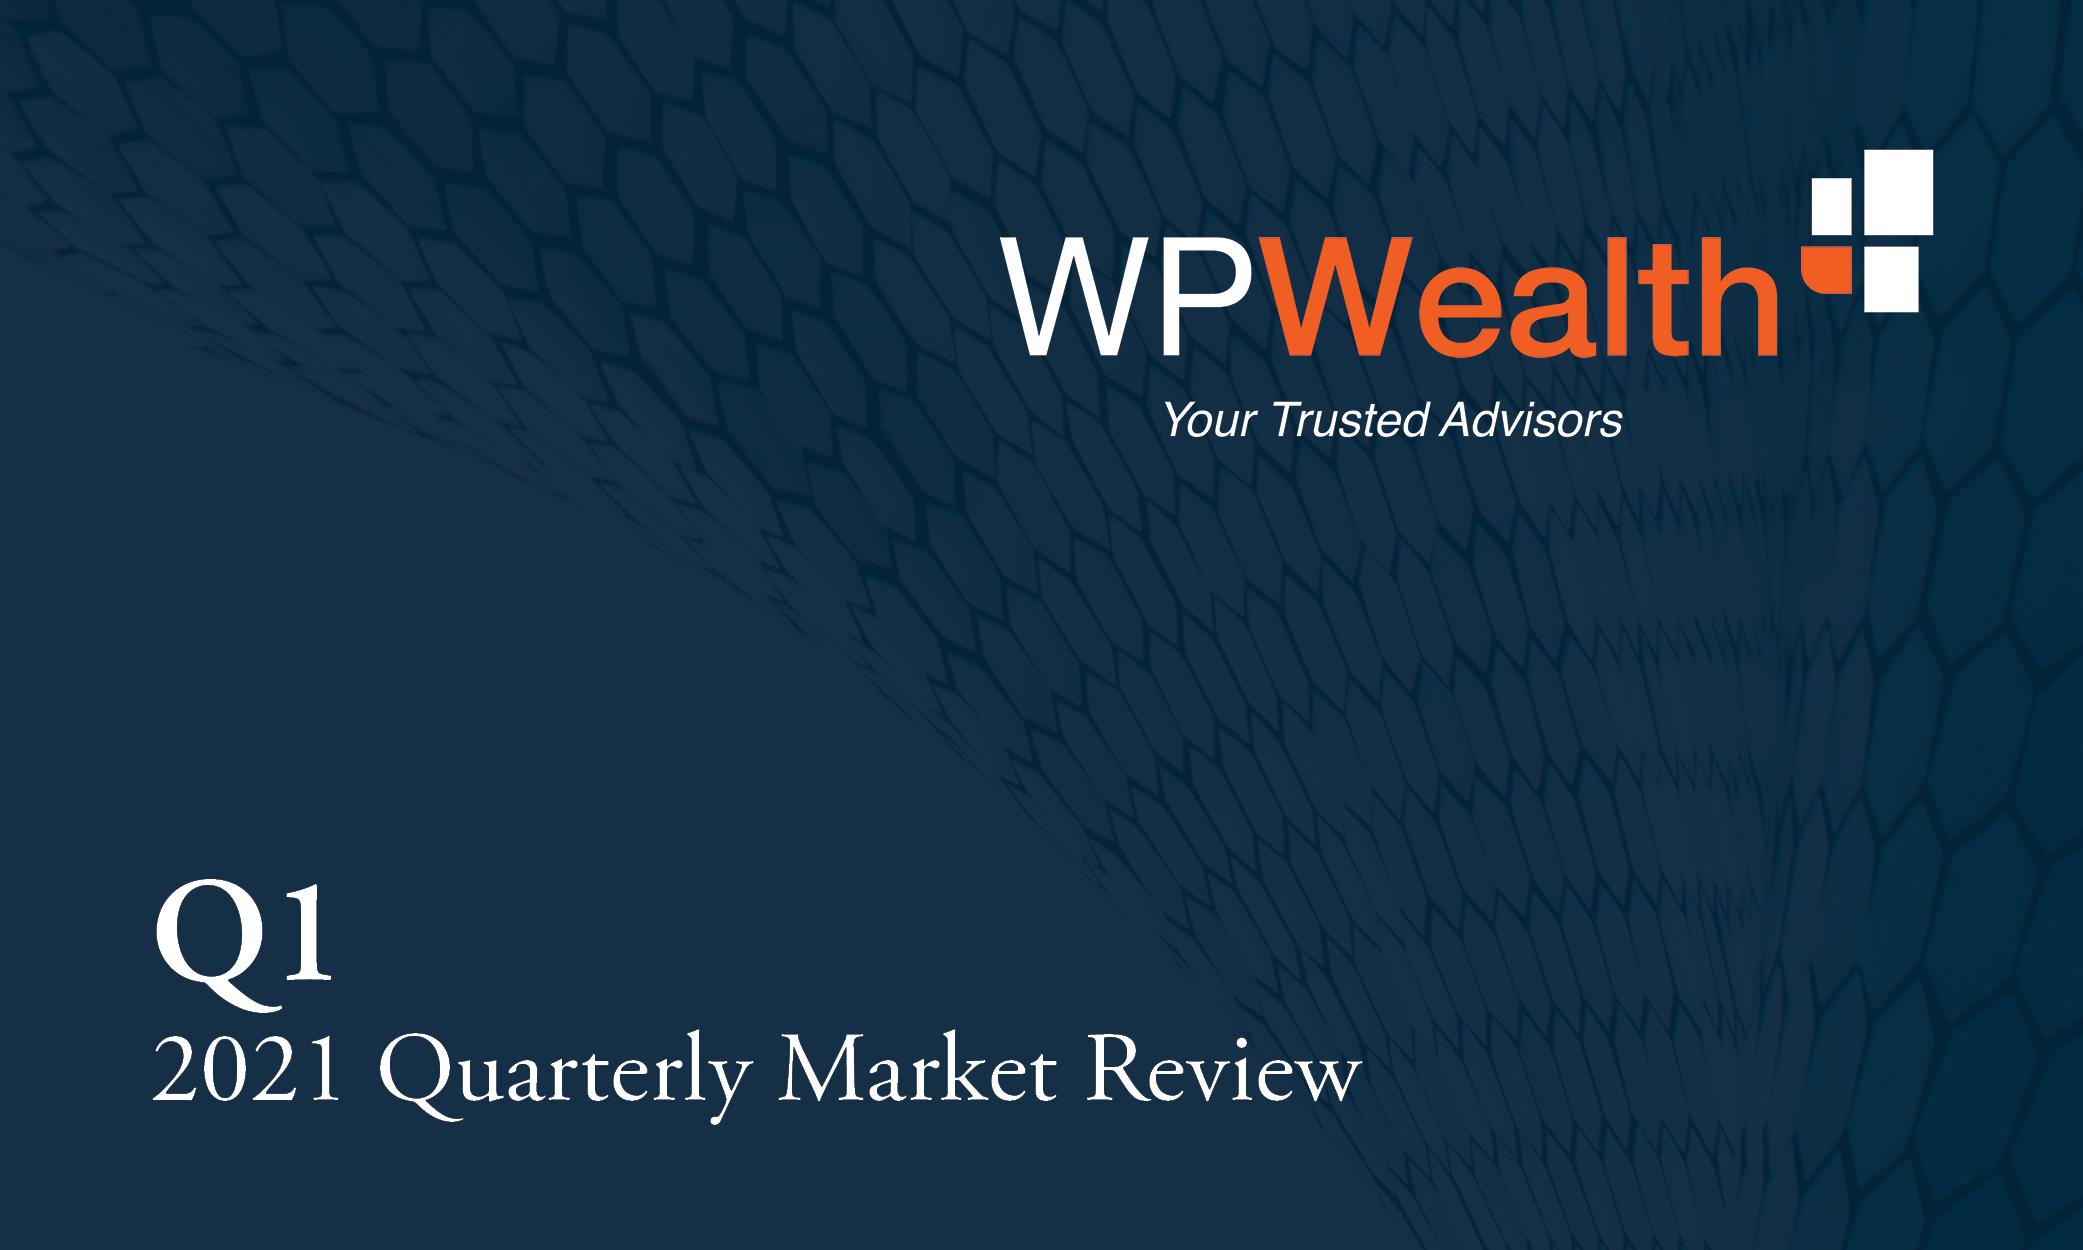 WPWealth Quarterly Market Review - Q1 2021